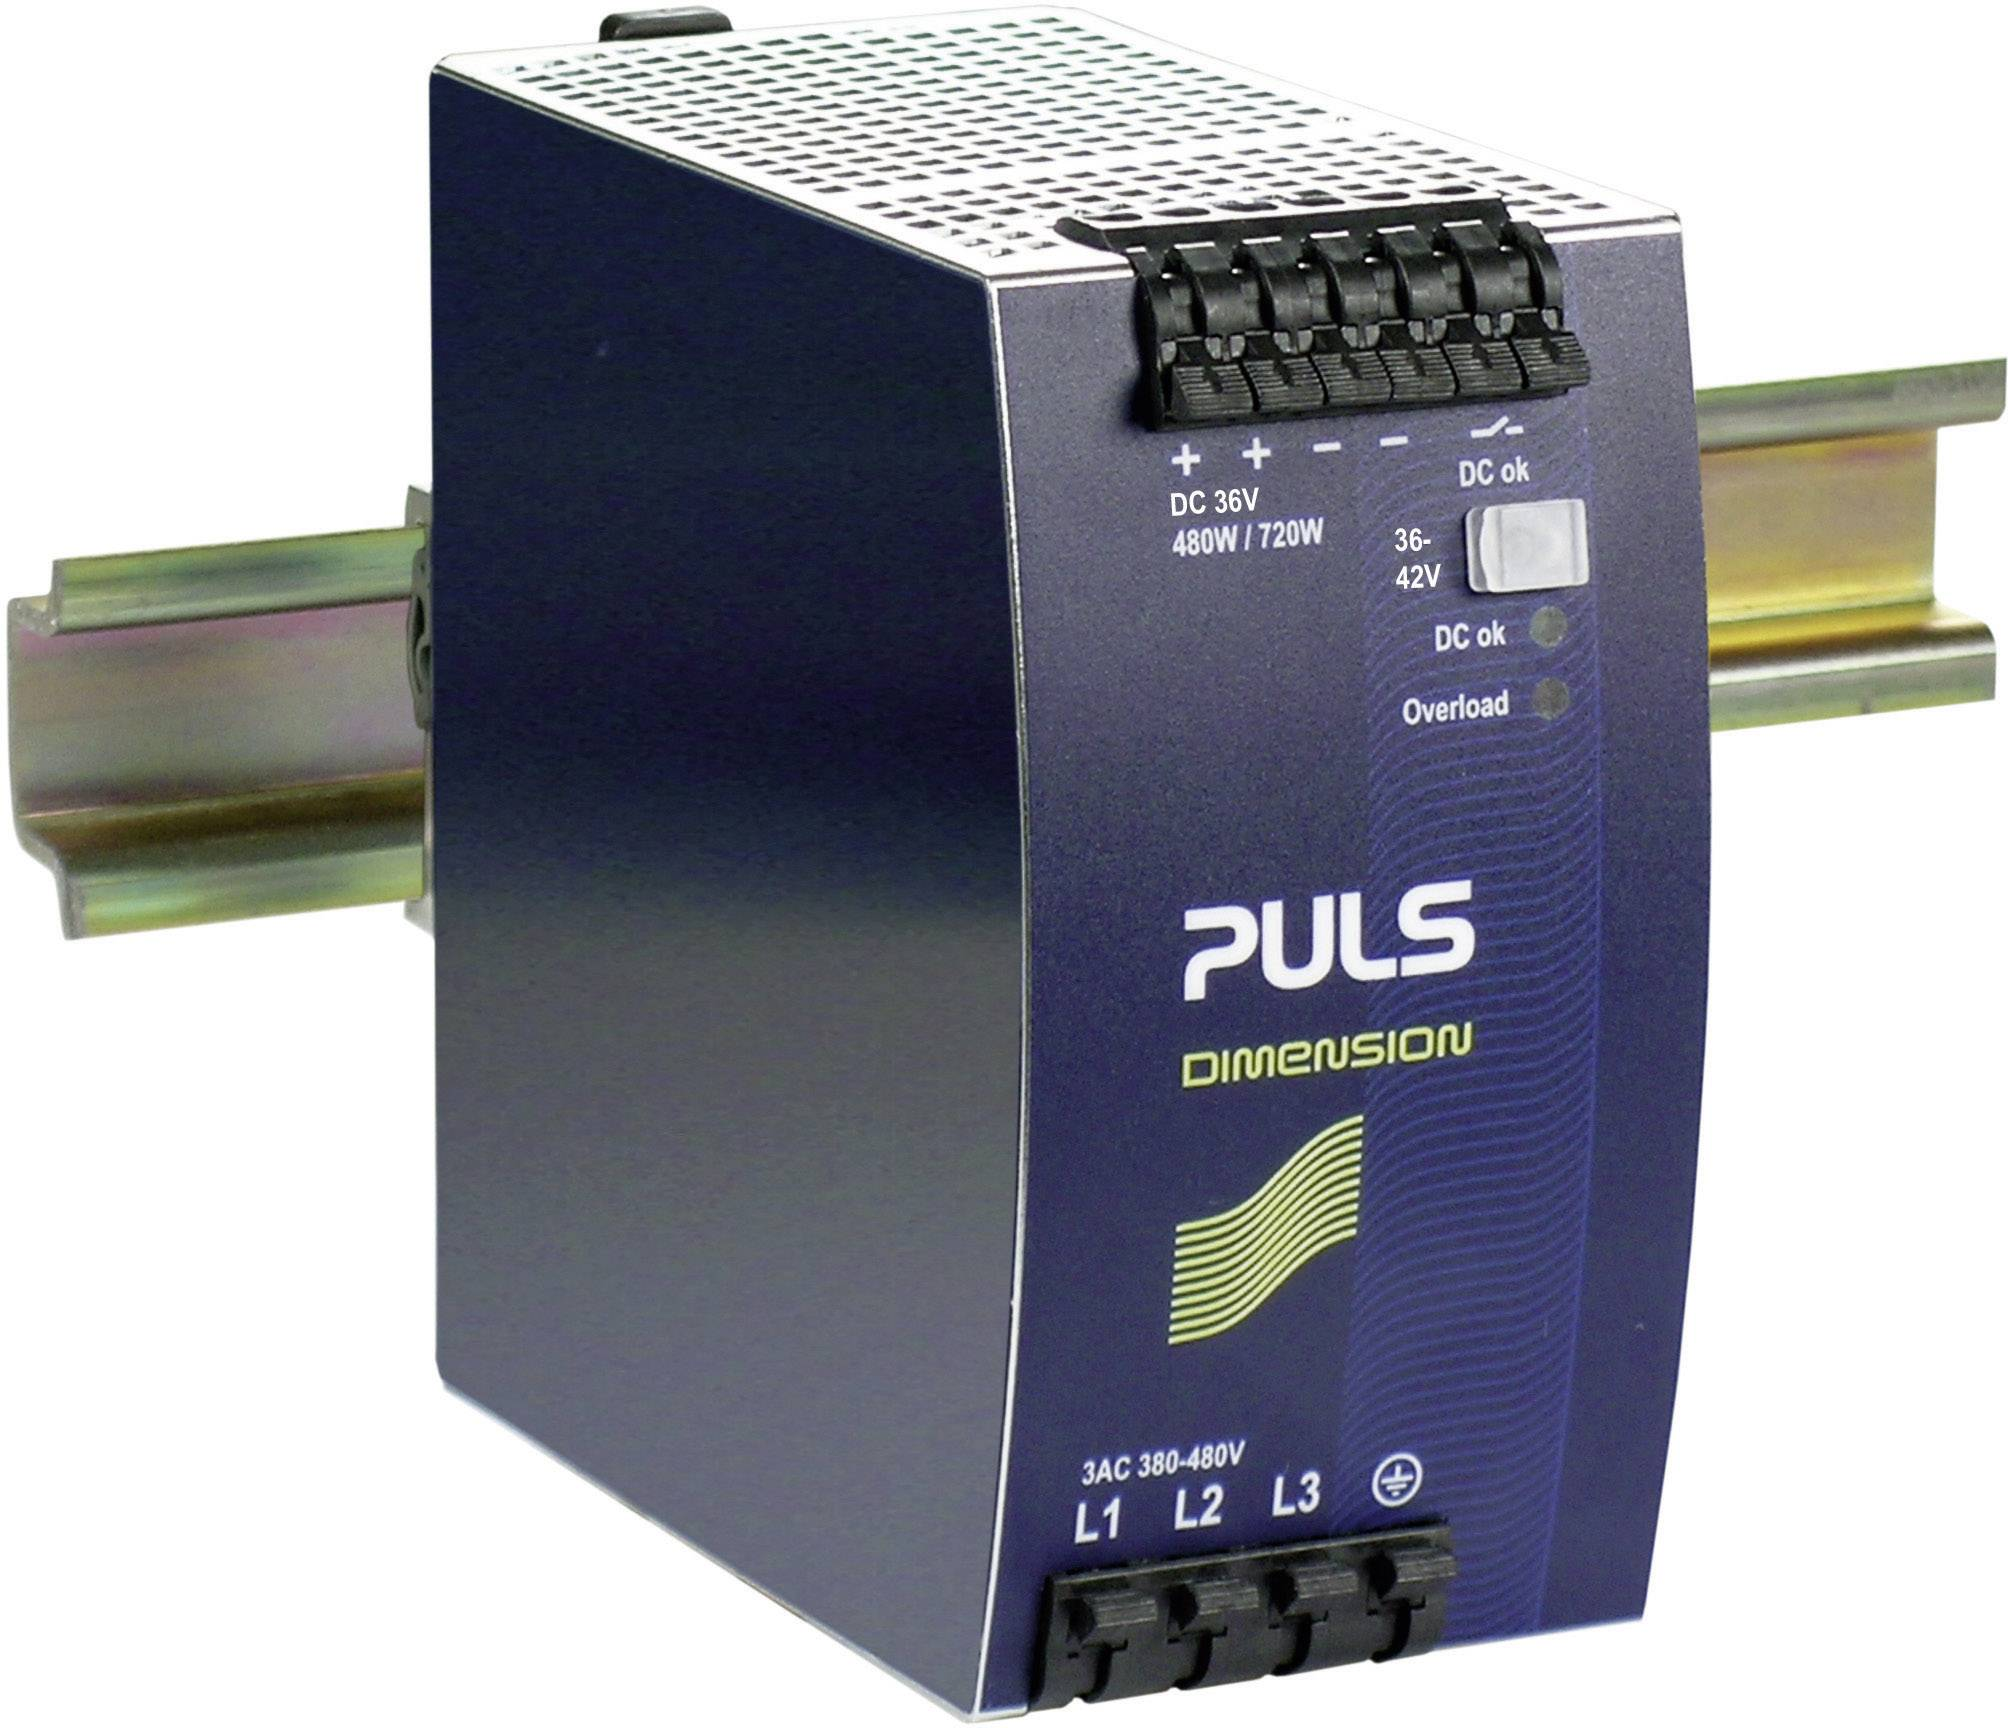 Sieťový zdroj na montážnu lištu (DIN lištu) PULS DIMENSION QT20.361, 1 x, 36 V/DC, 13.3 A, 480 W